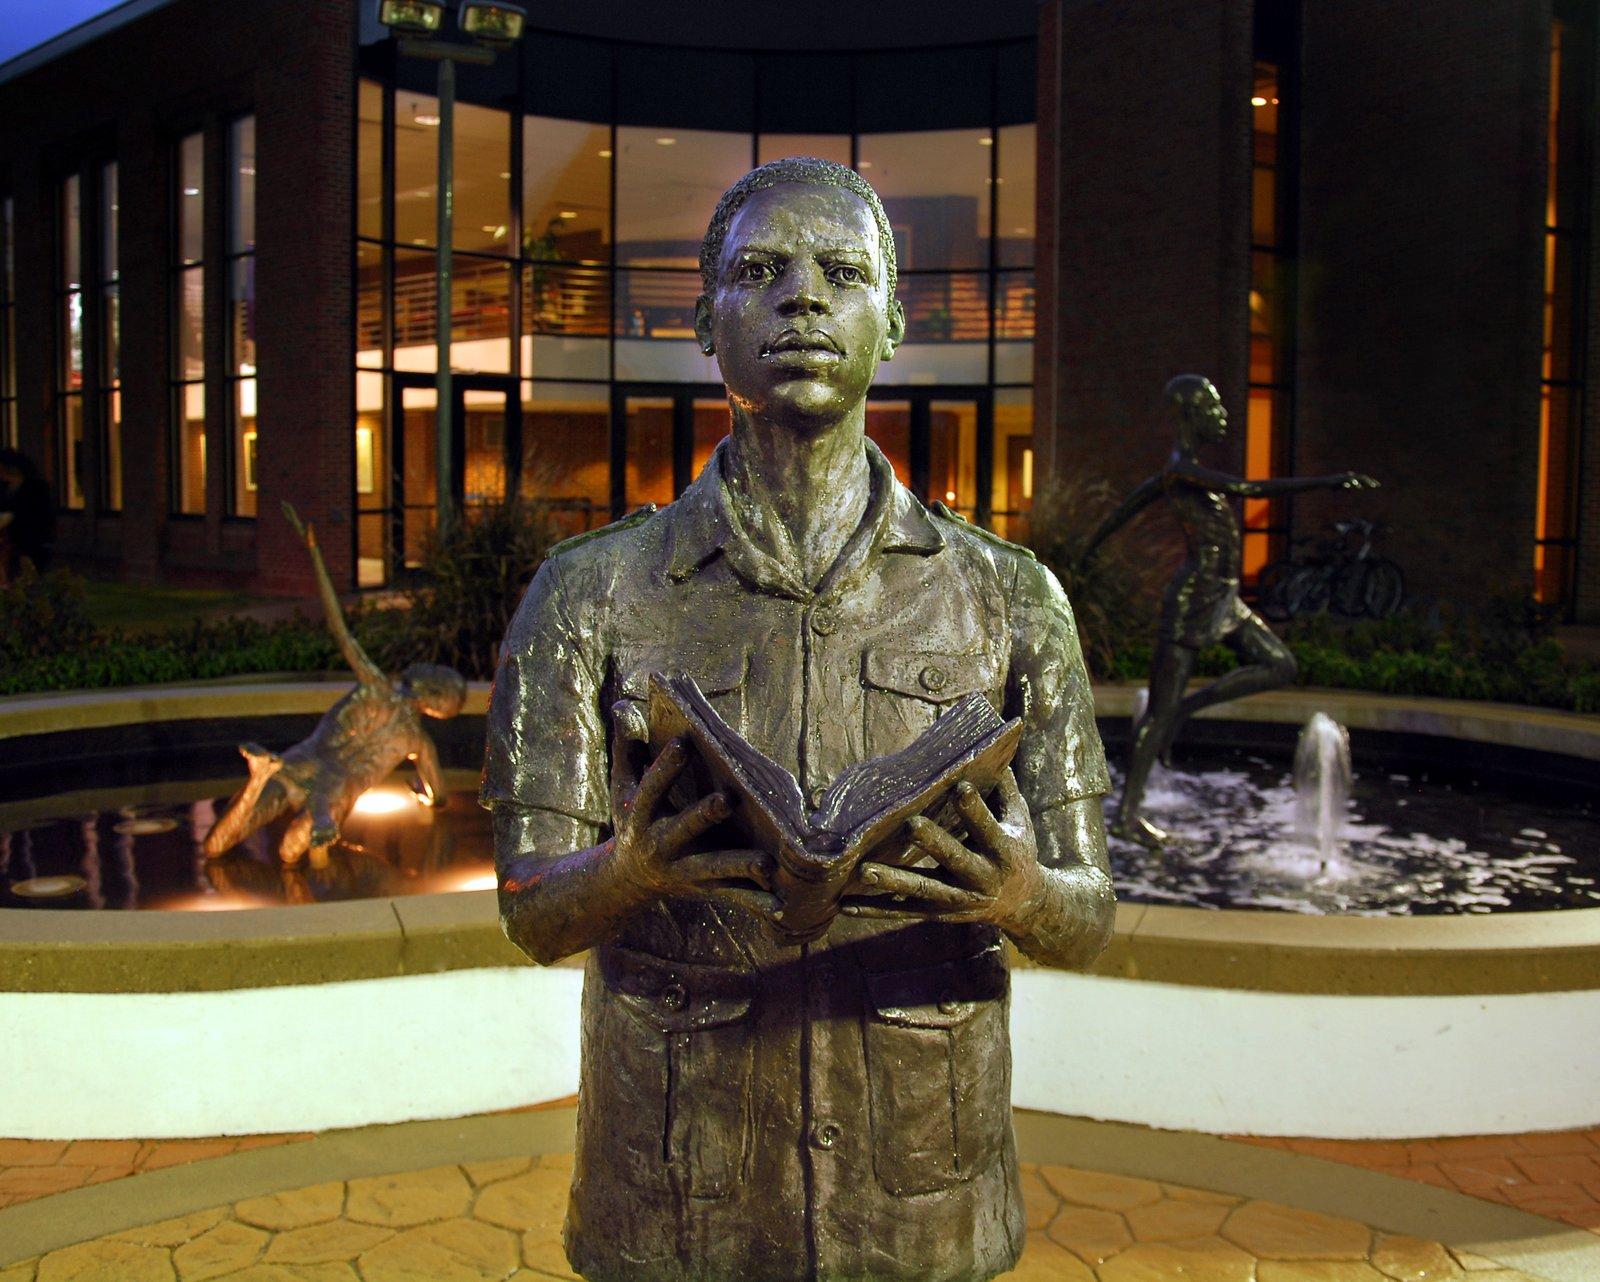 Morris Statues0559-001.jpg